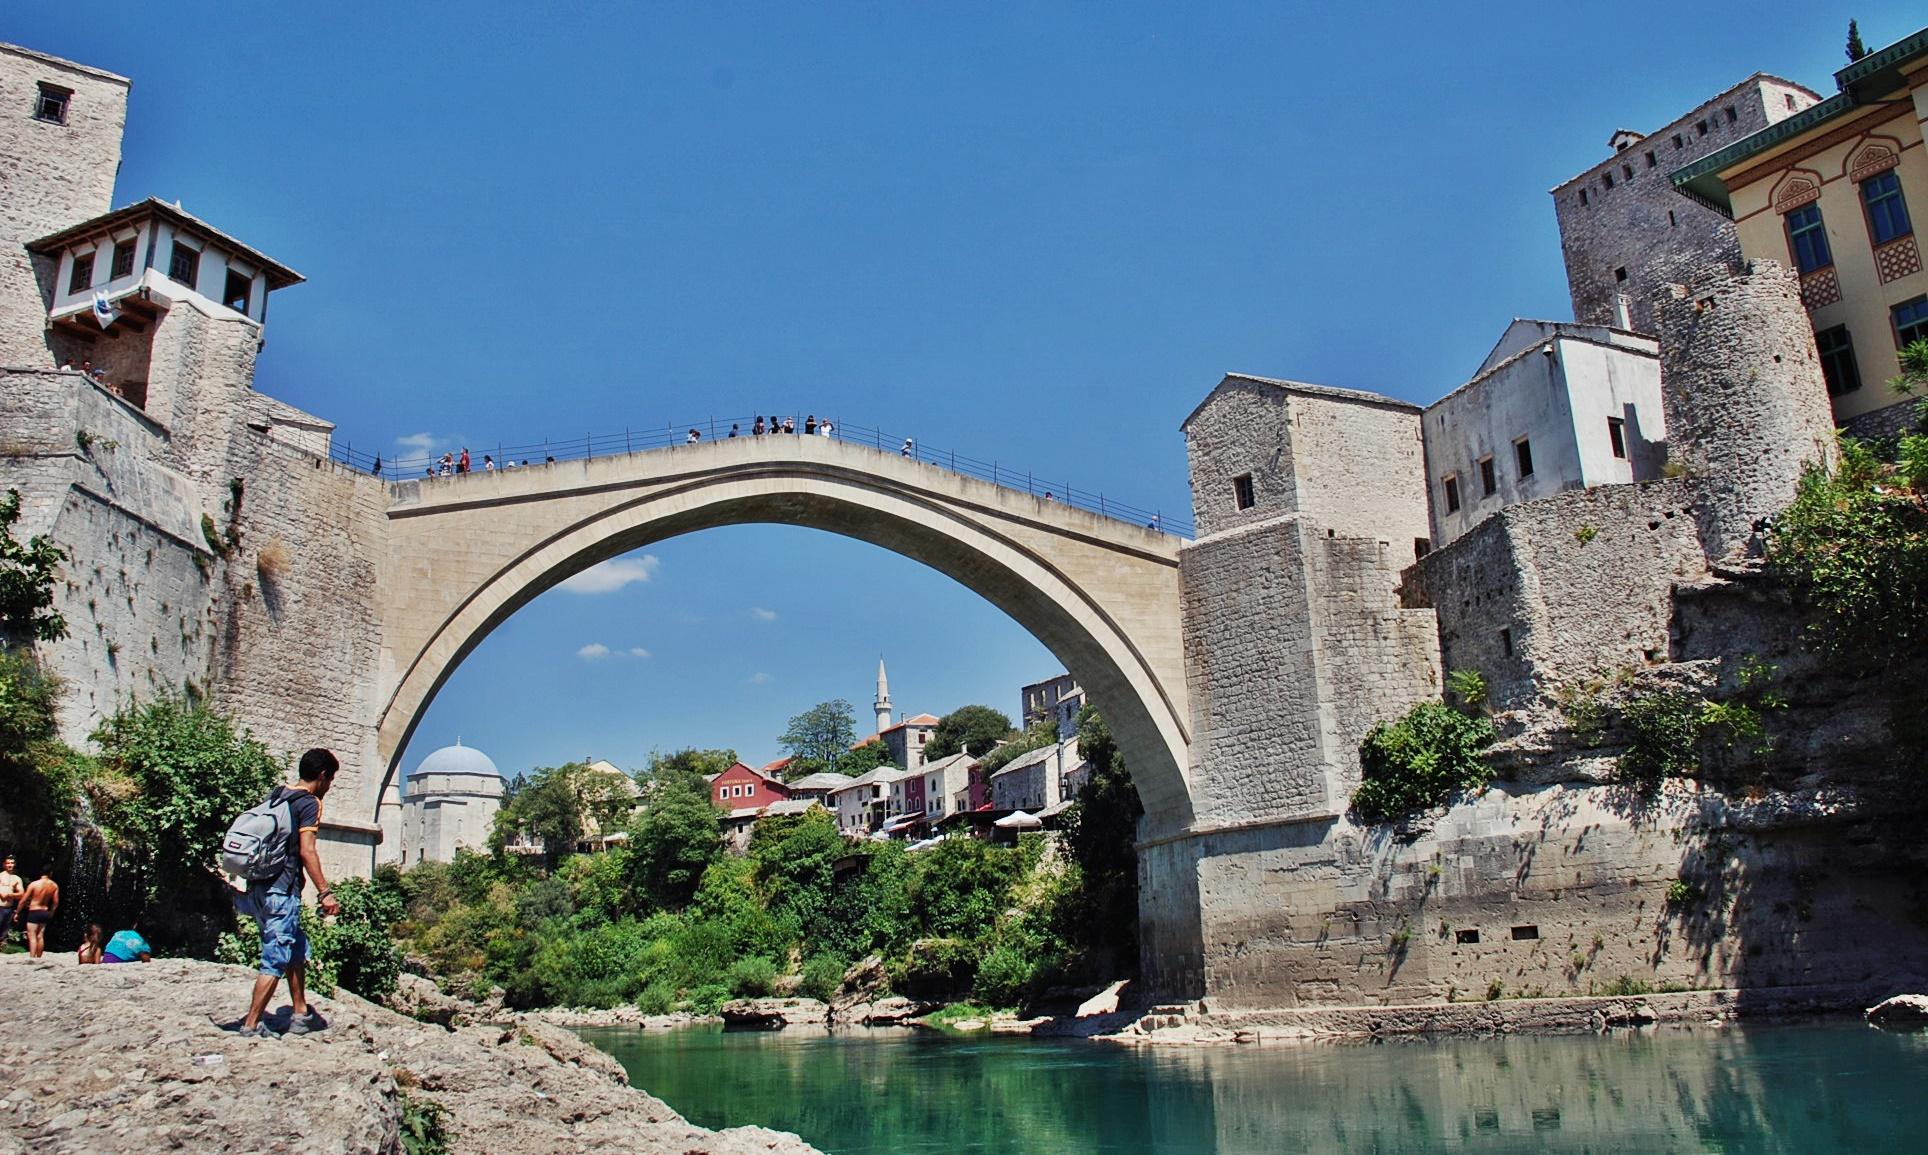 Sanjin Halilovic, Old bridge, Mostar